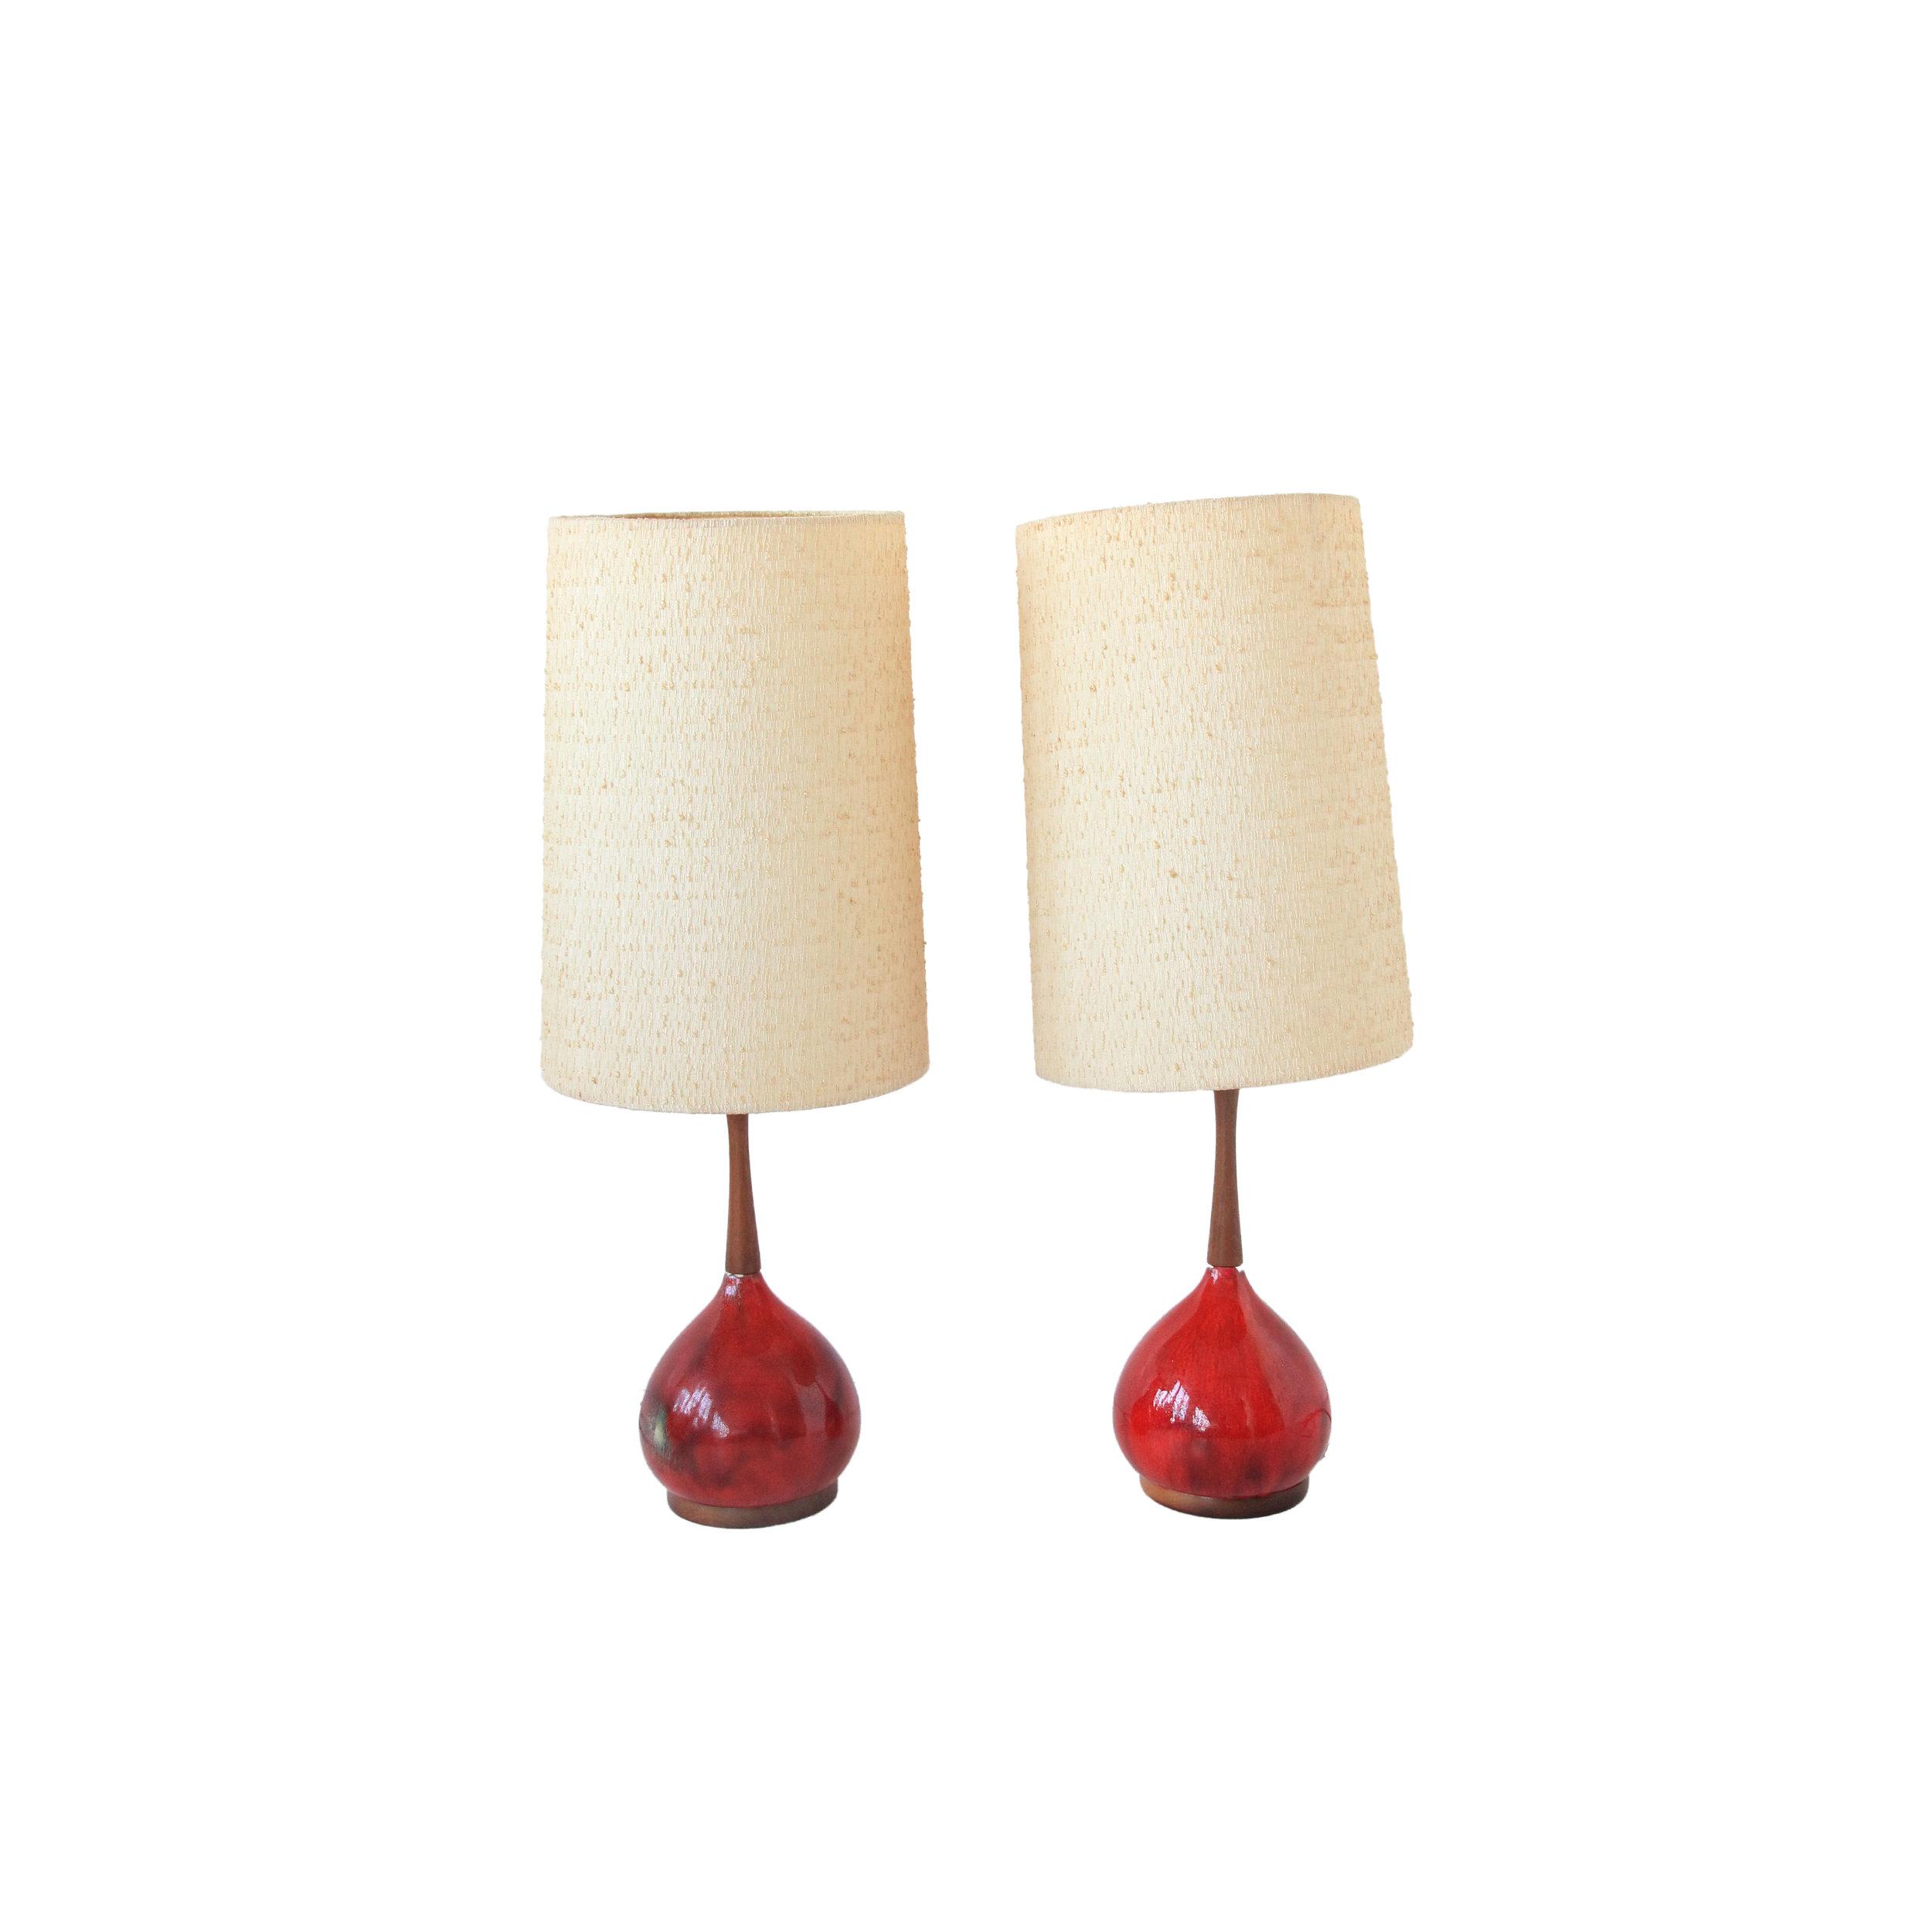 Vintage Mid Century Modern Orange Glazed Lamps